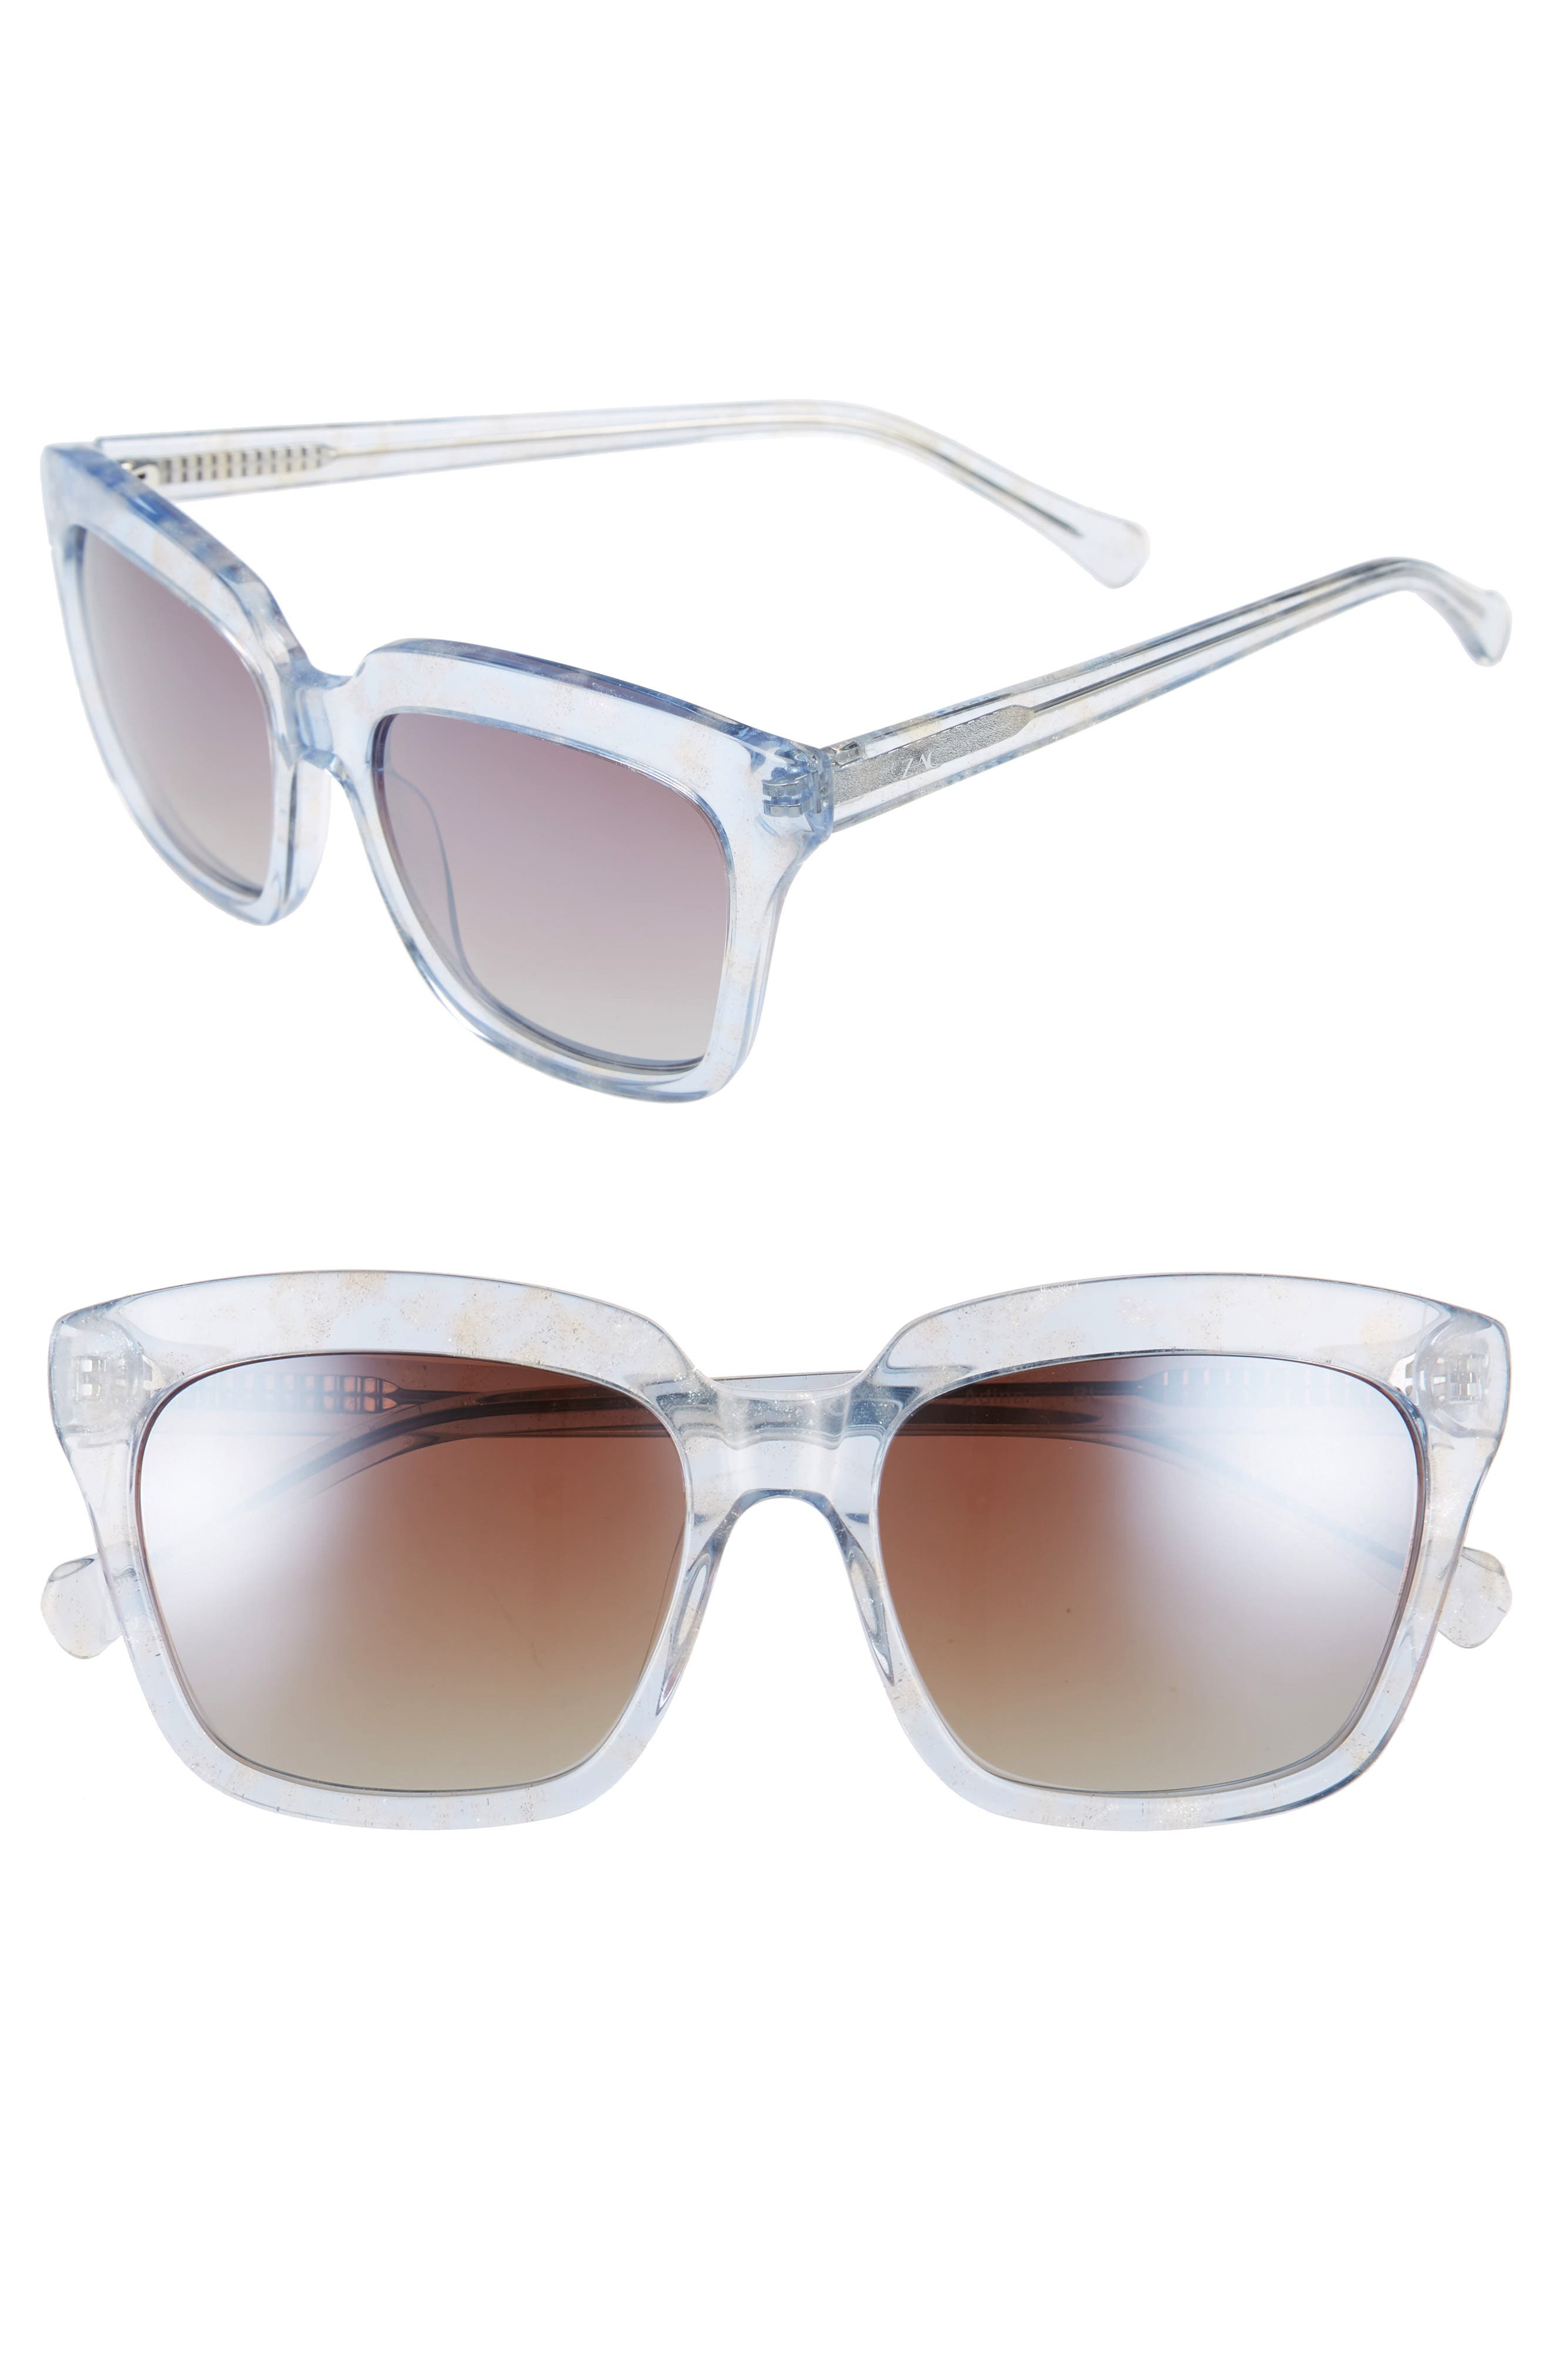 ZAC Zac Posen Adina 56mm Polarized Sunglasses